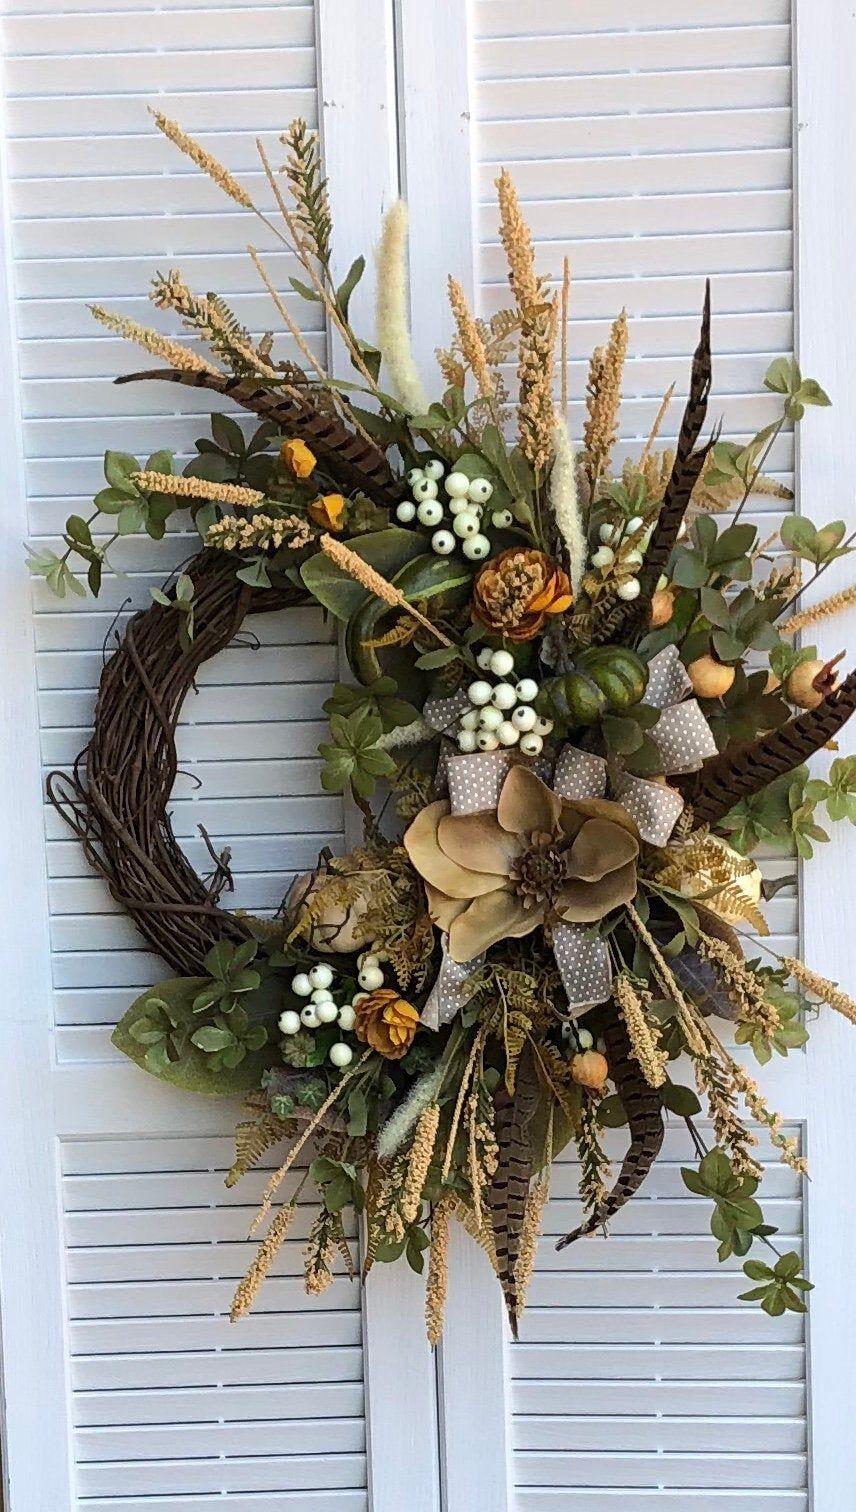 Photo of Autumn magnolia wreath for front door / autumn wheat wreath for autumn / autumn berry wreath with ranunculus / autumn pumpkin wreath